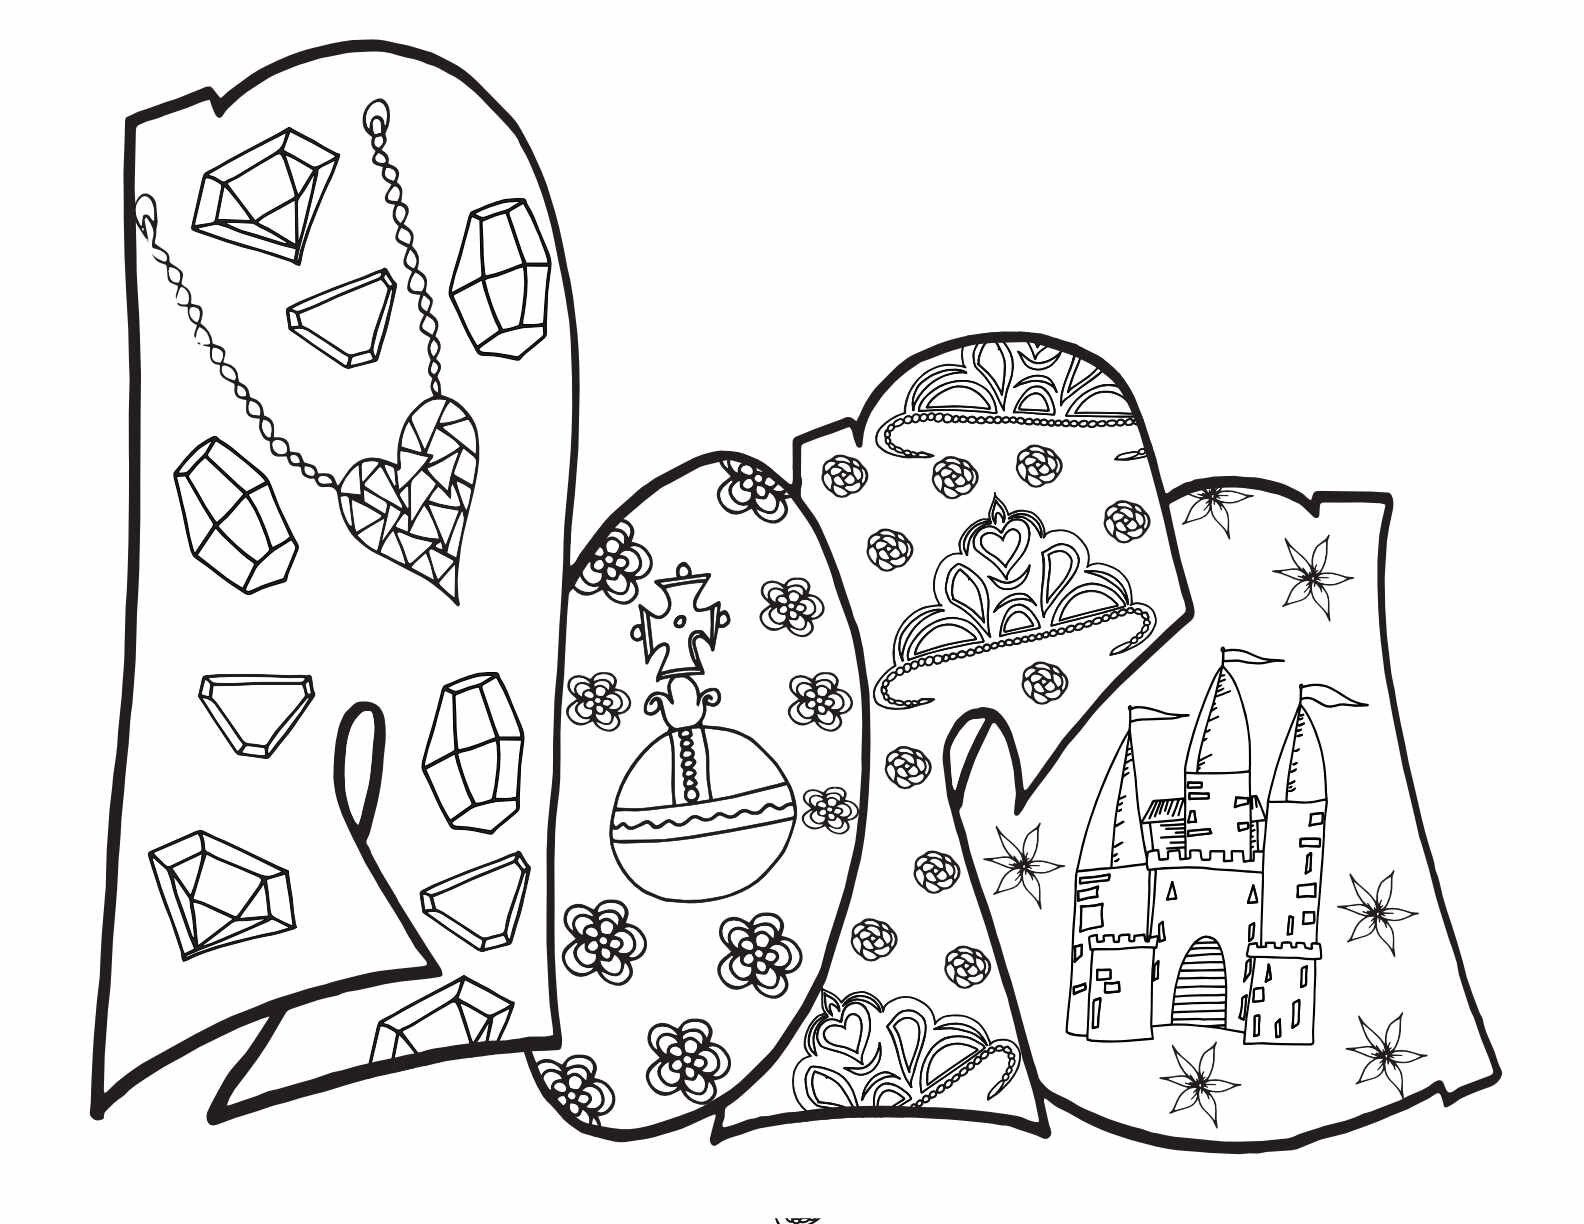 Nora Free Printable Princess Coloring Page Stevie Doodles Princess Coloring Pages Free Coloring Pages Free Kids Coloring Pages